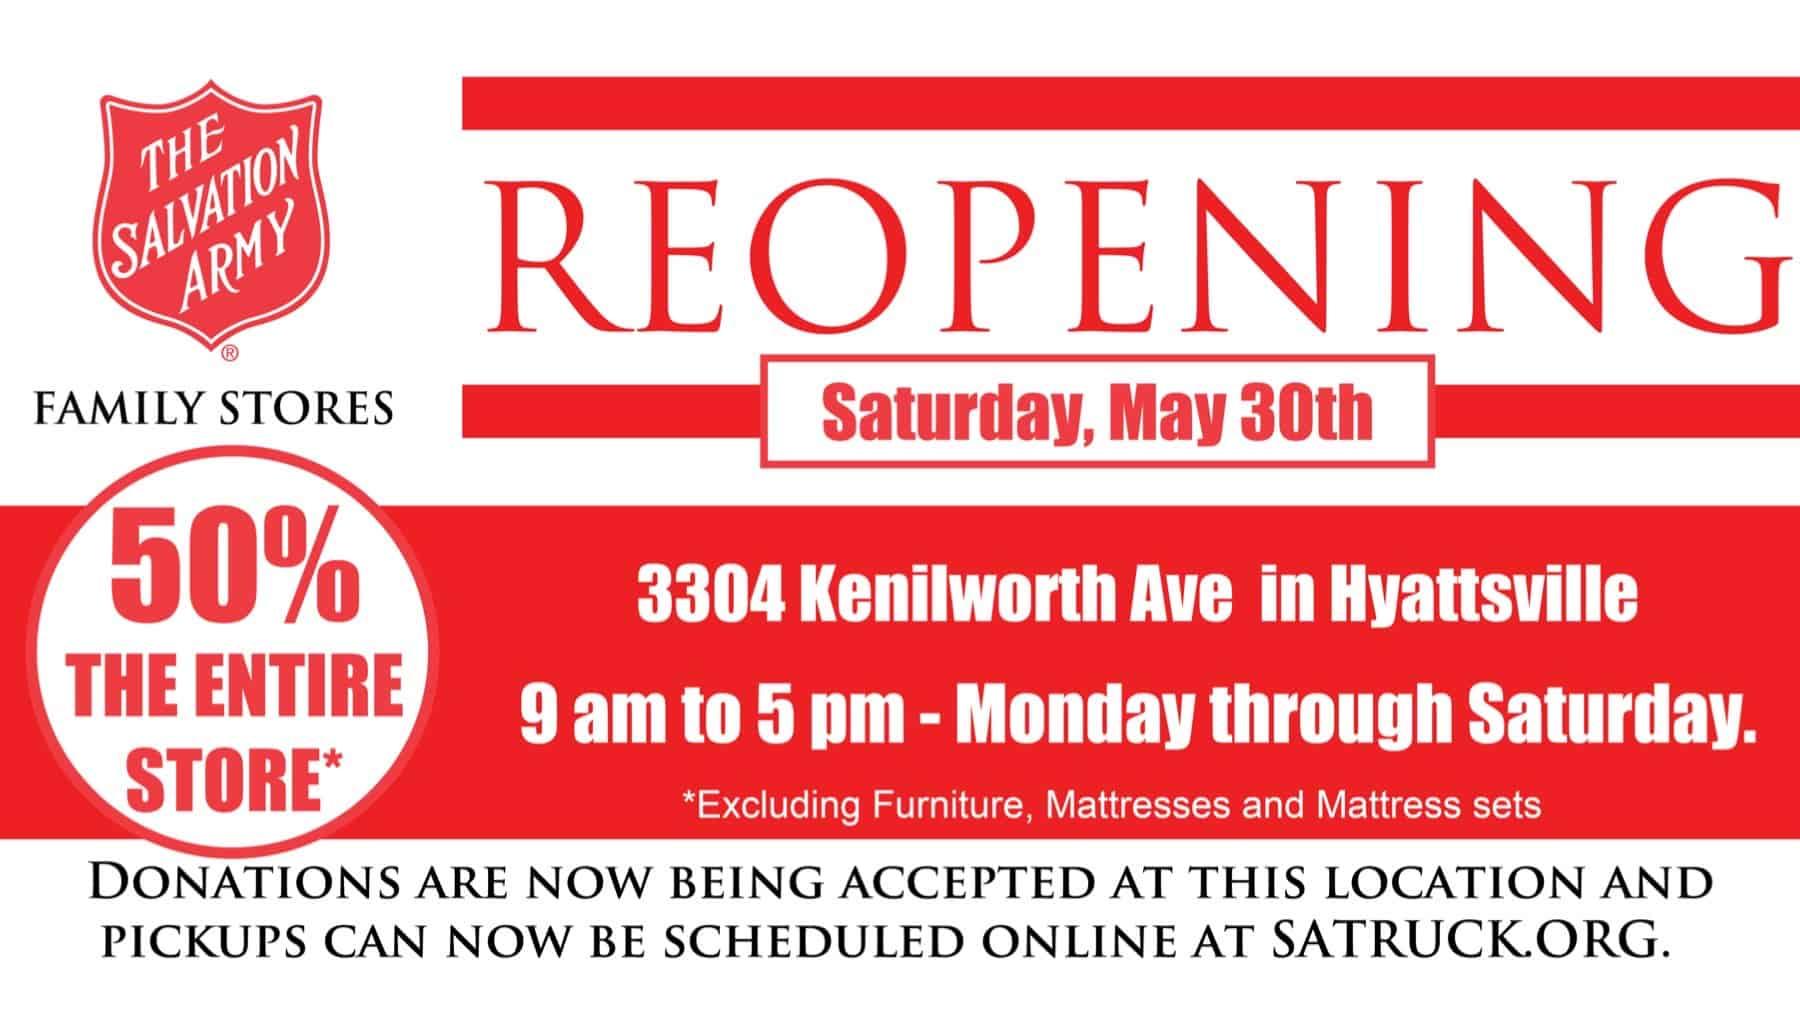 Salvation Army Reopening in Hyattsville